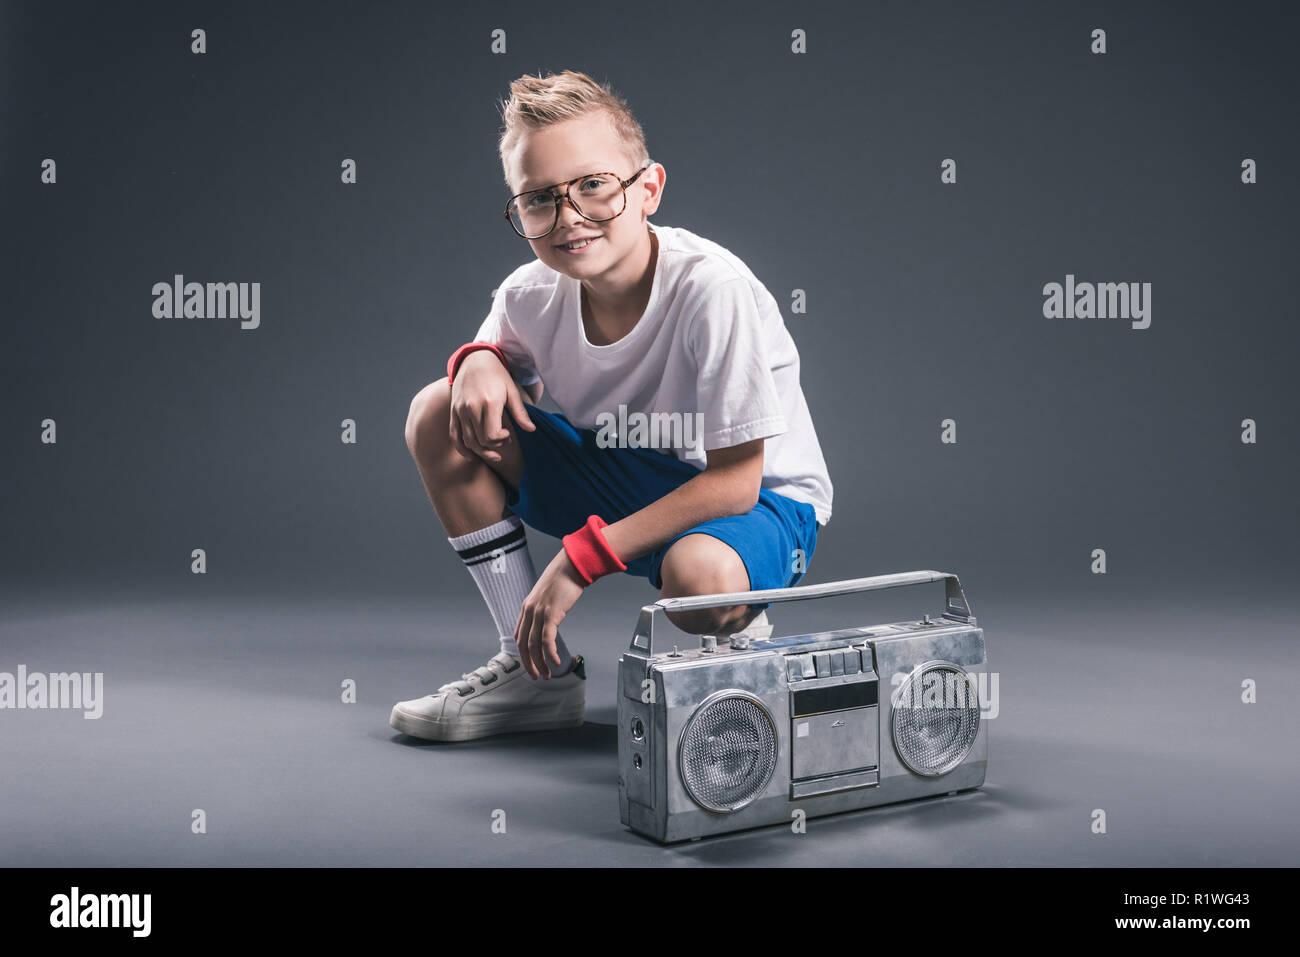 stylish preteen boy in eyeglasses with boombox posing on grey backdrop - Stock Image